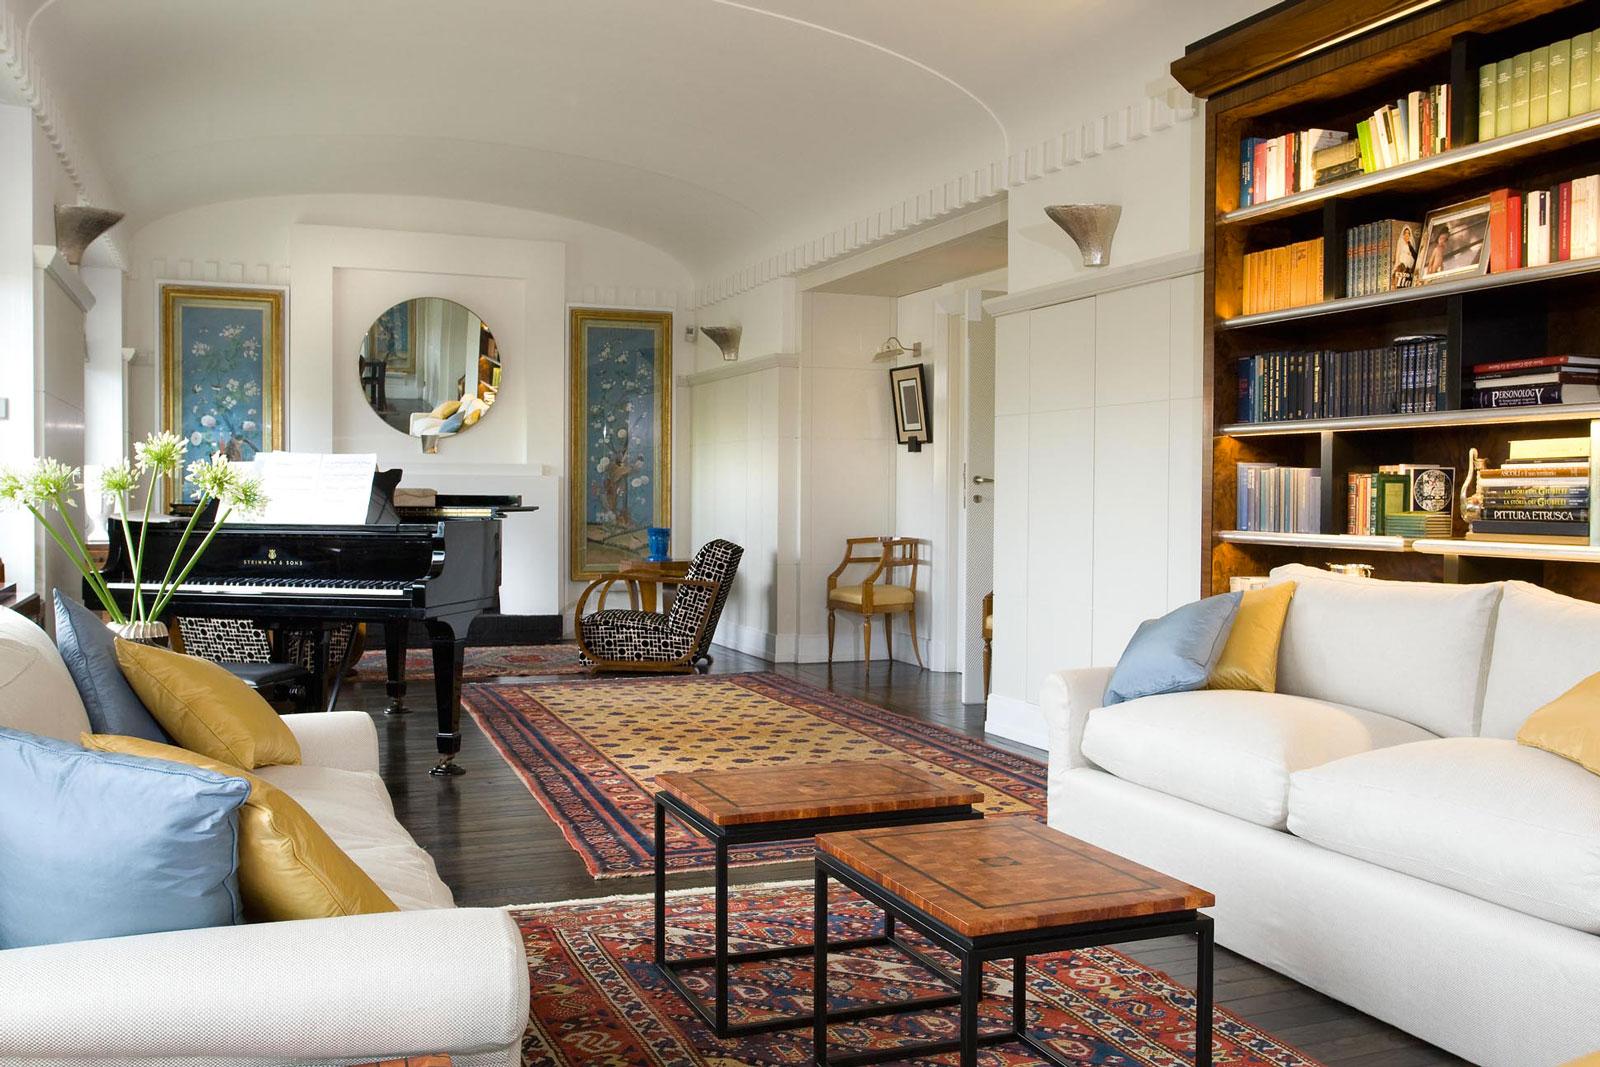 Arredamento classico e moderno copertina man casa for Salotto arredamento